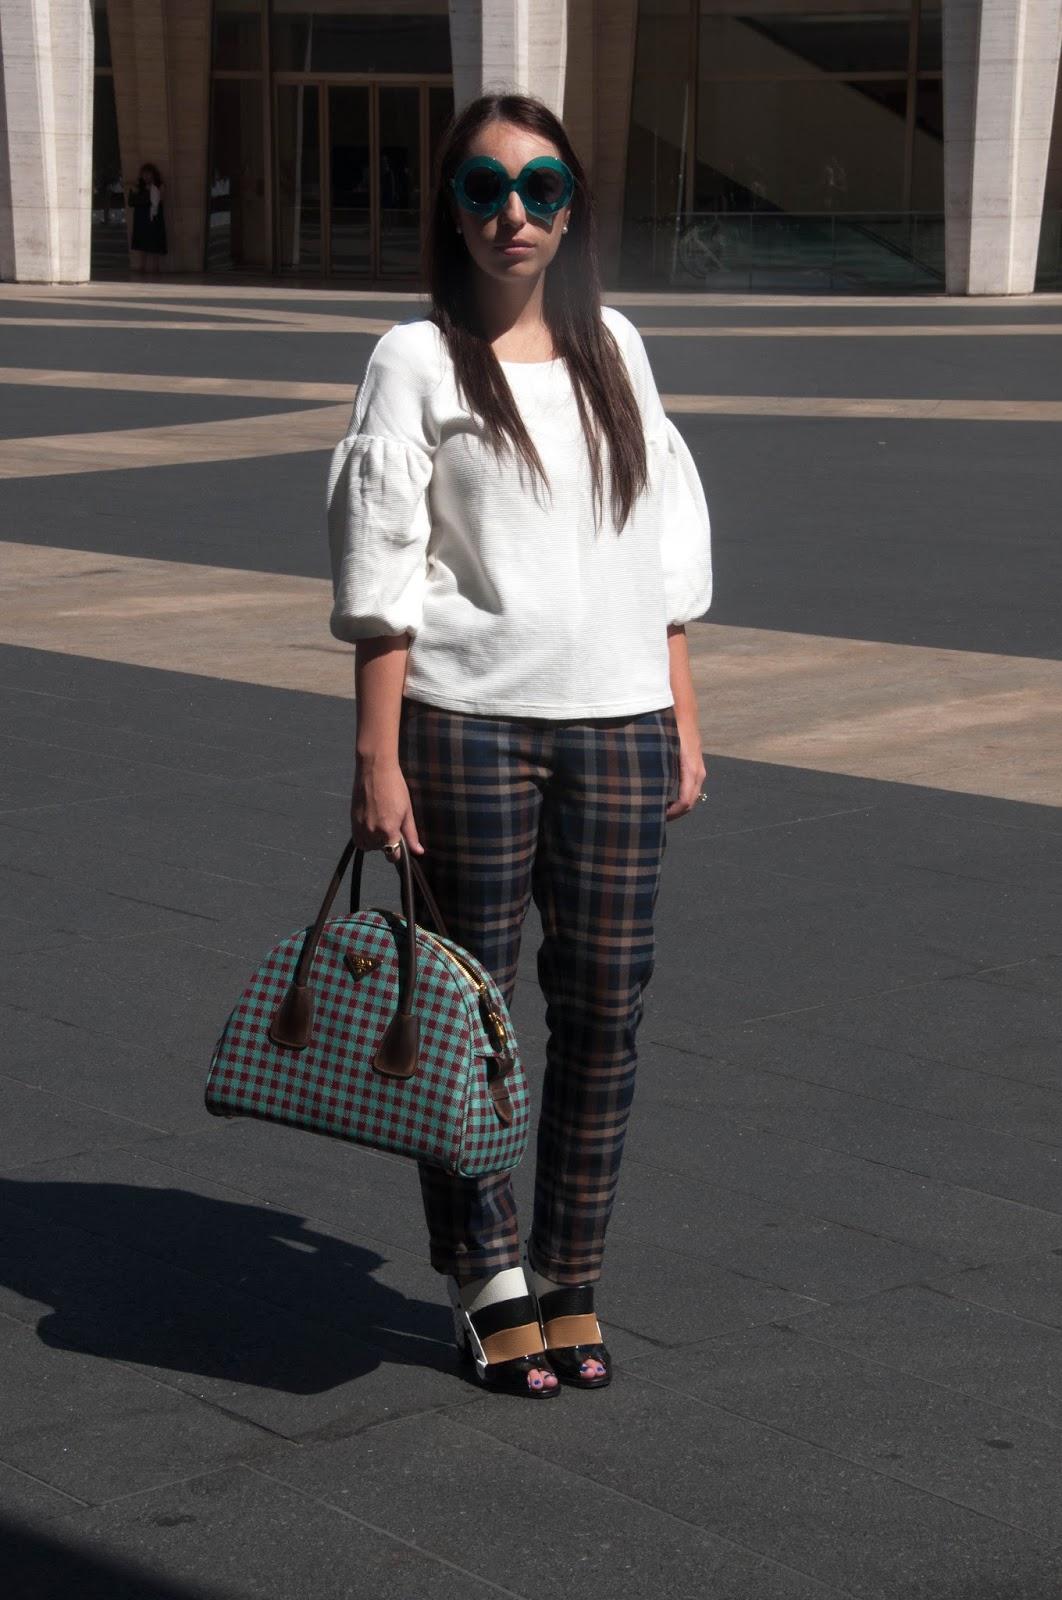 fashion blog, style blog, new york fashion week, anthropologie ootd, ootd, karen walker space bug